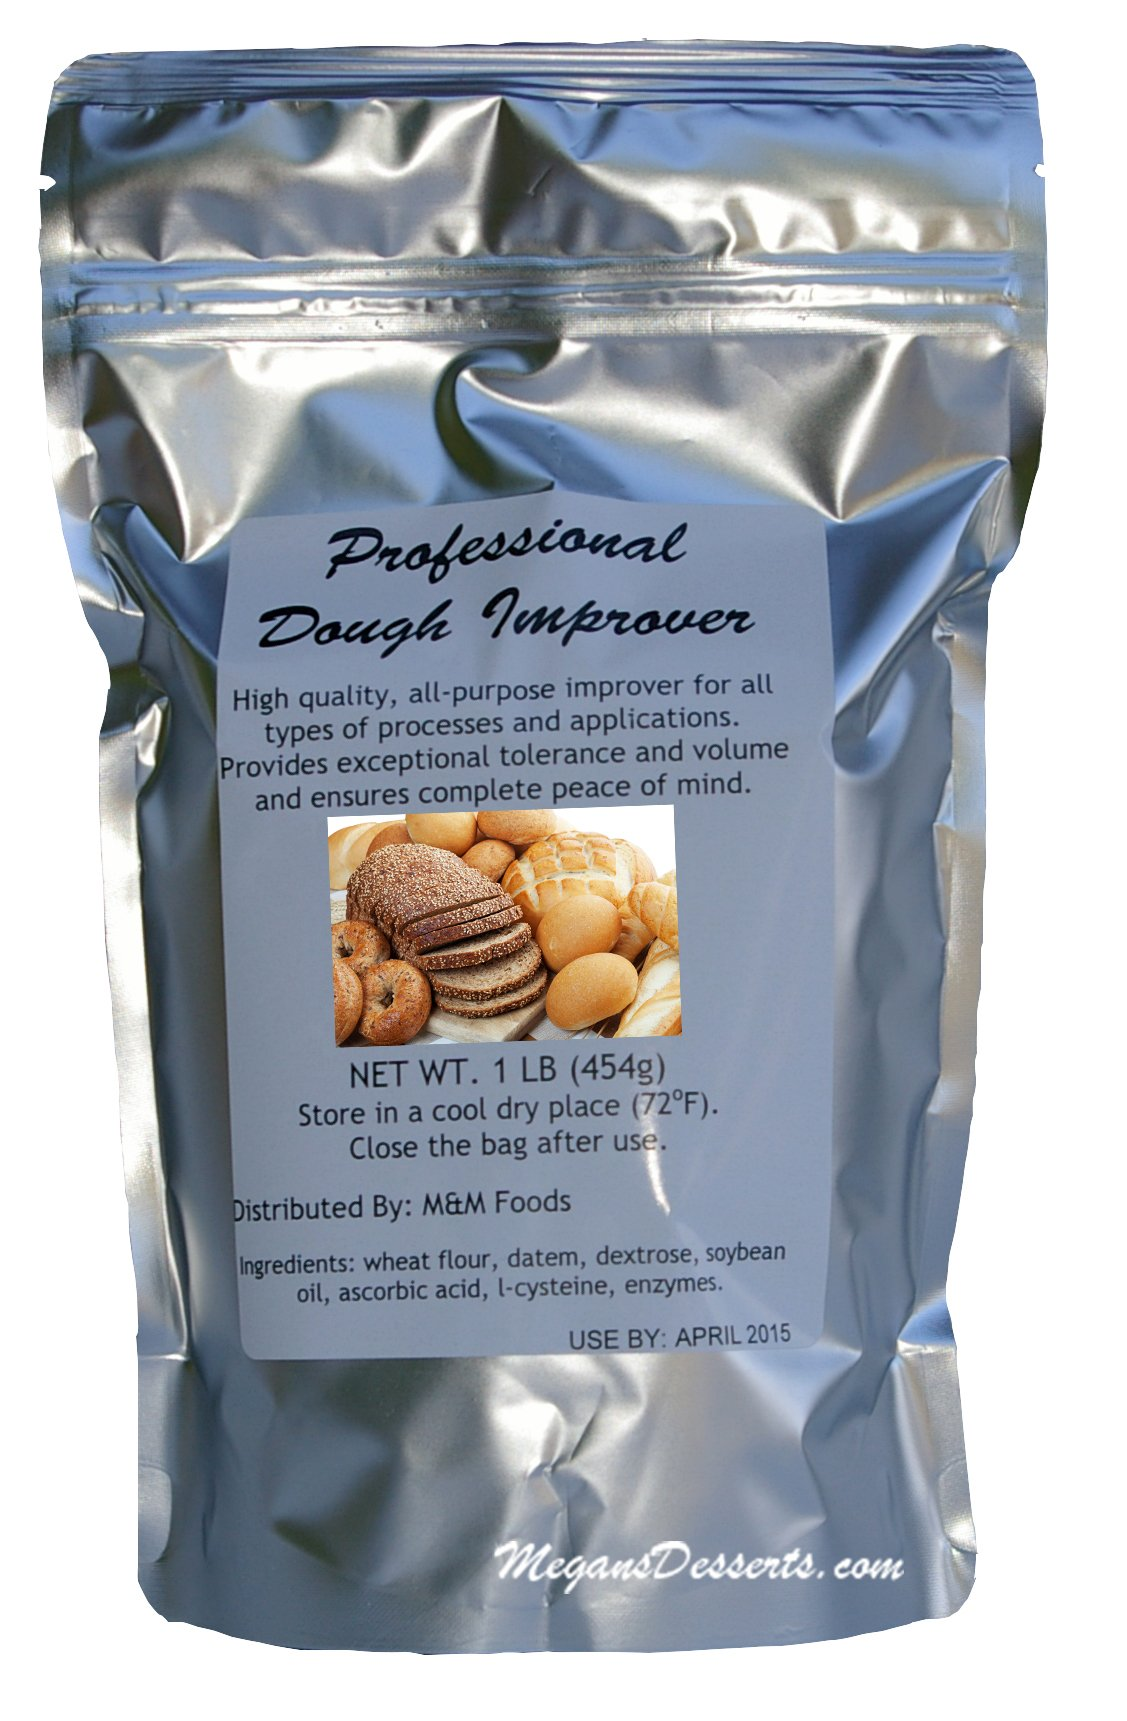 Professional Dough Improver - 1lb Bag by M&M Foods